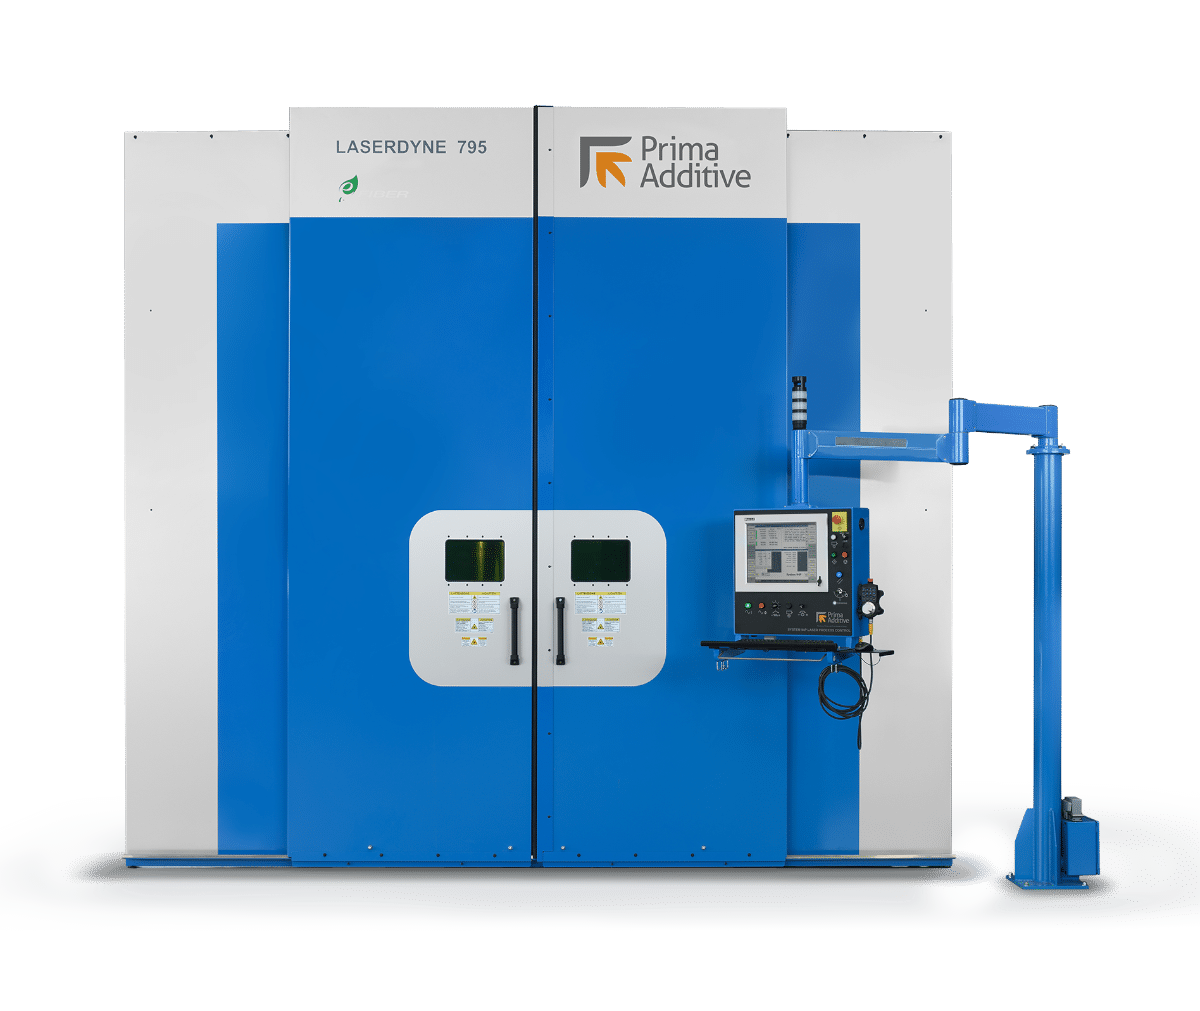 Laserdyne 795 Prima Additive - Imprimantes 3D